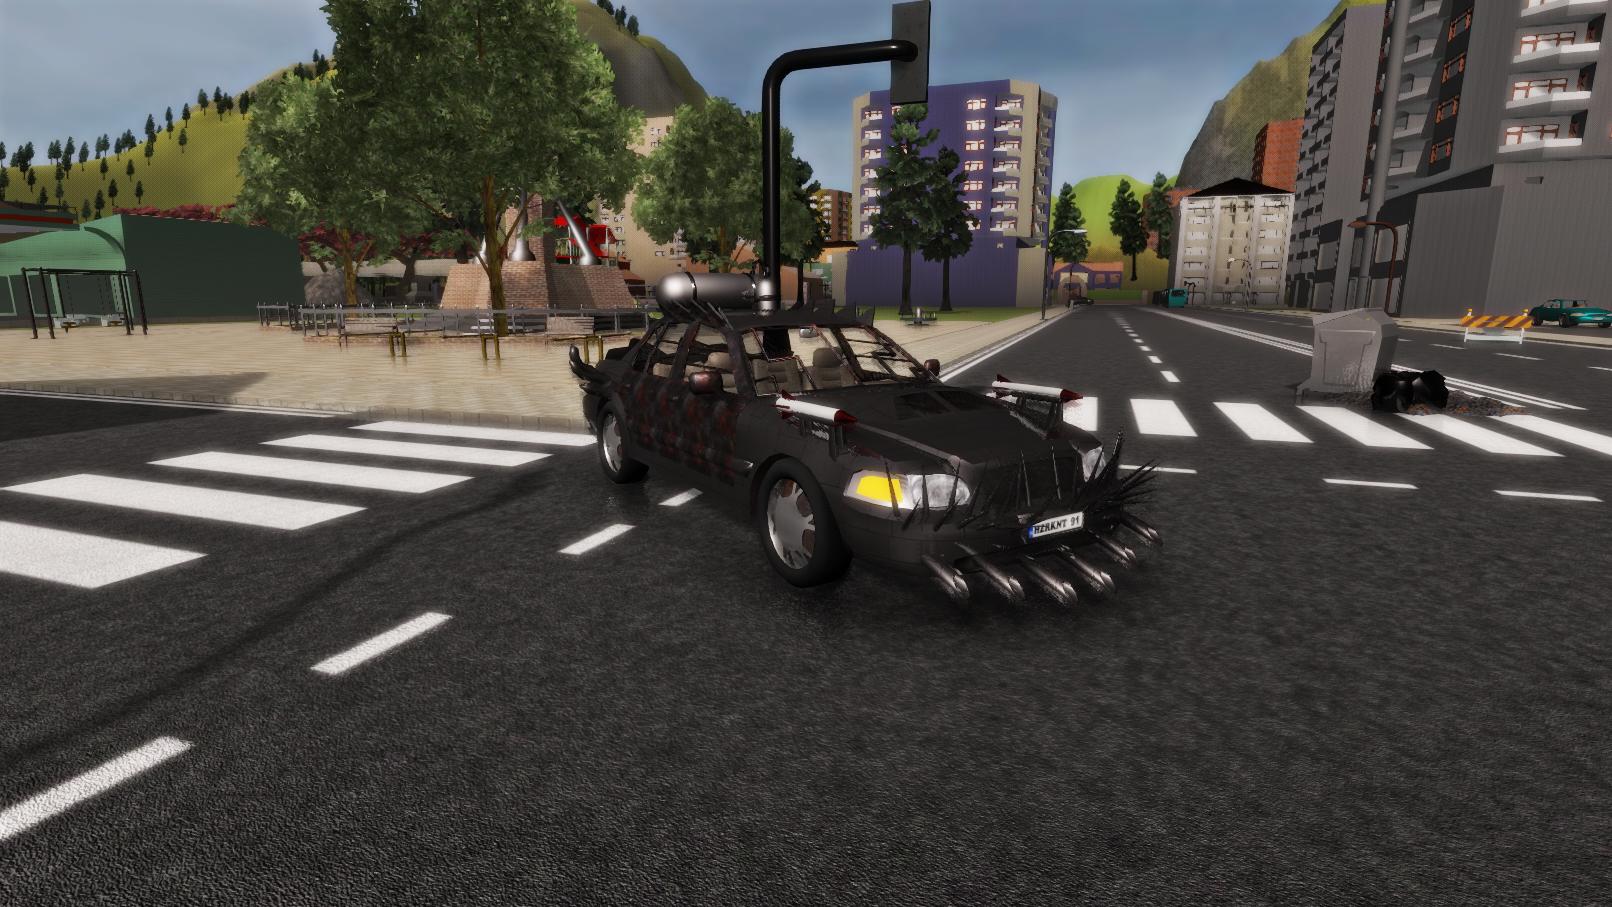 Vehicle 2